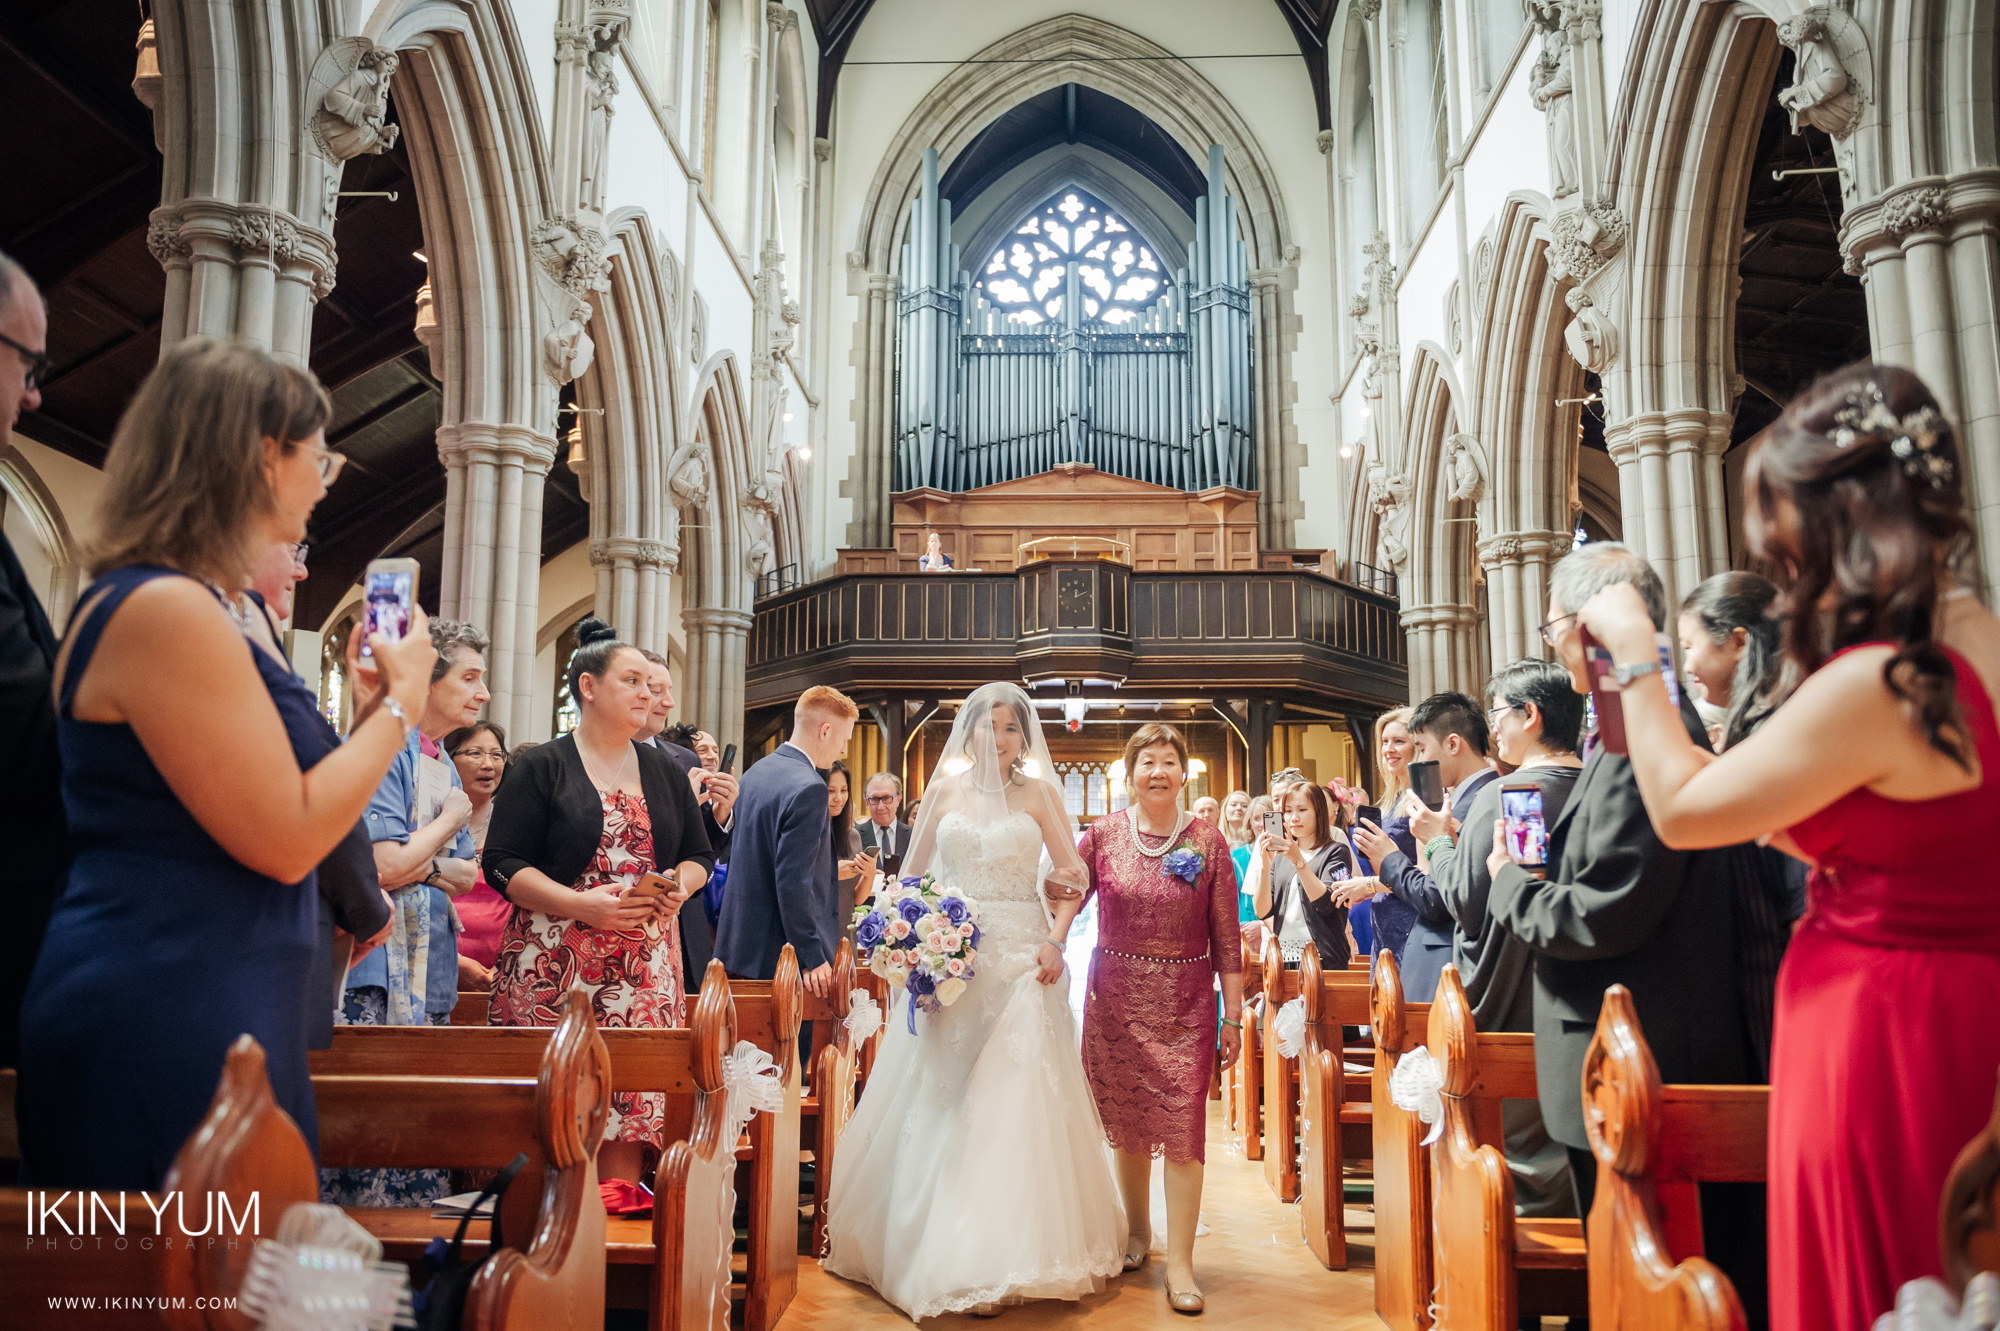 Teresa & Johnathan Weddong Day - The Ceremony-0046.jpg